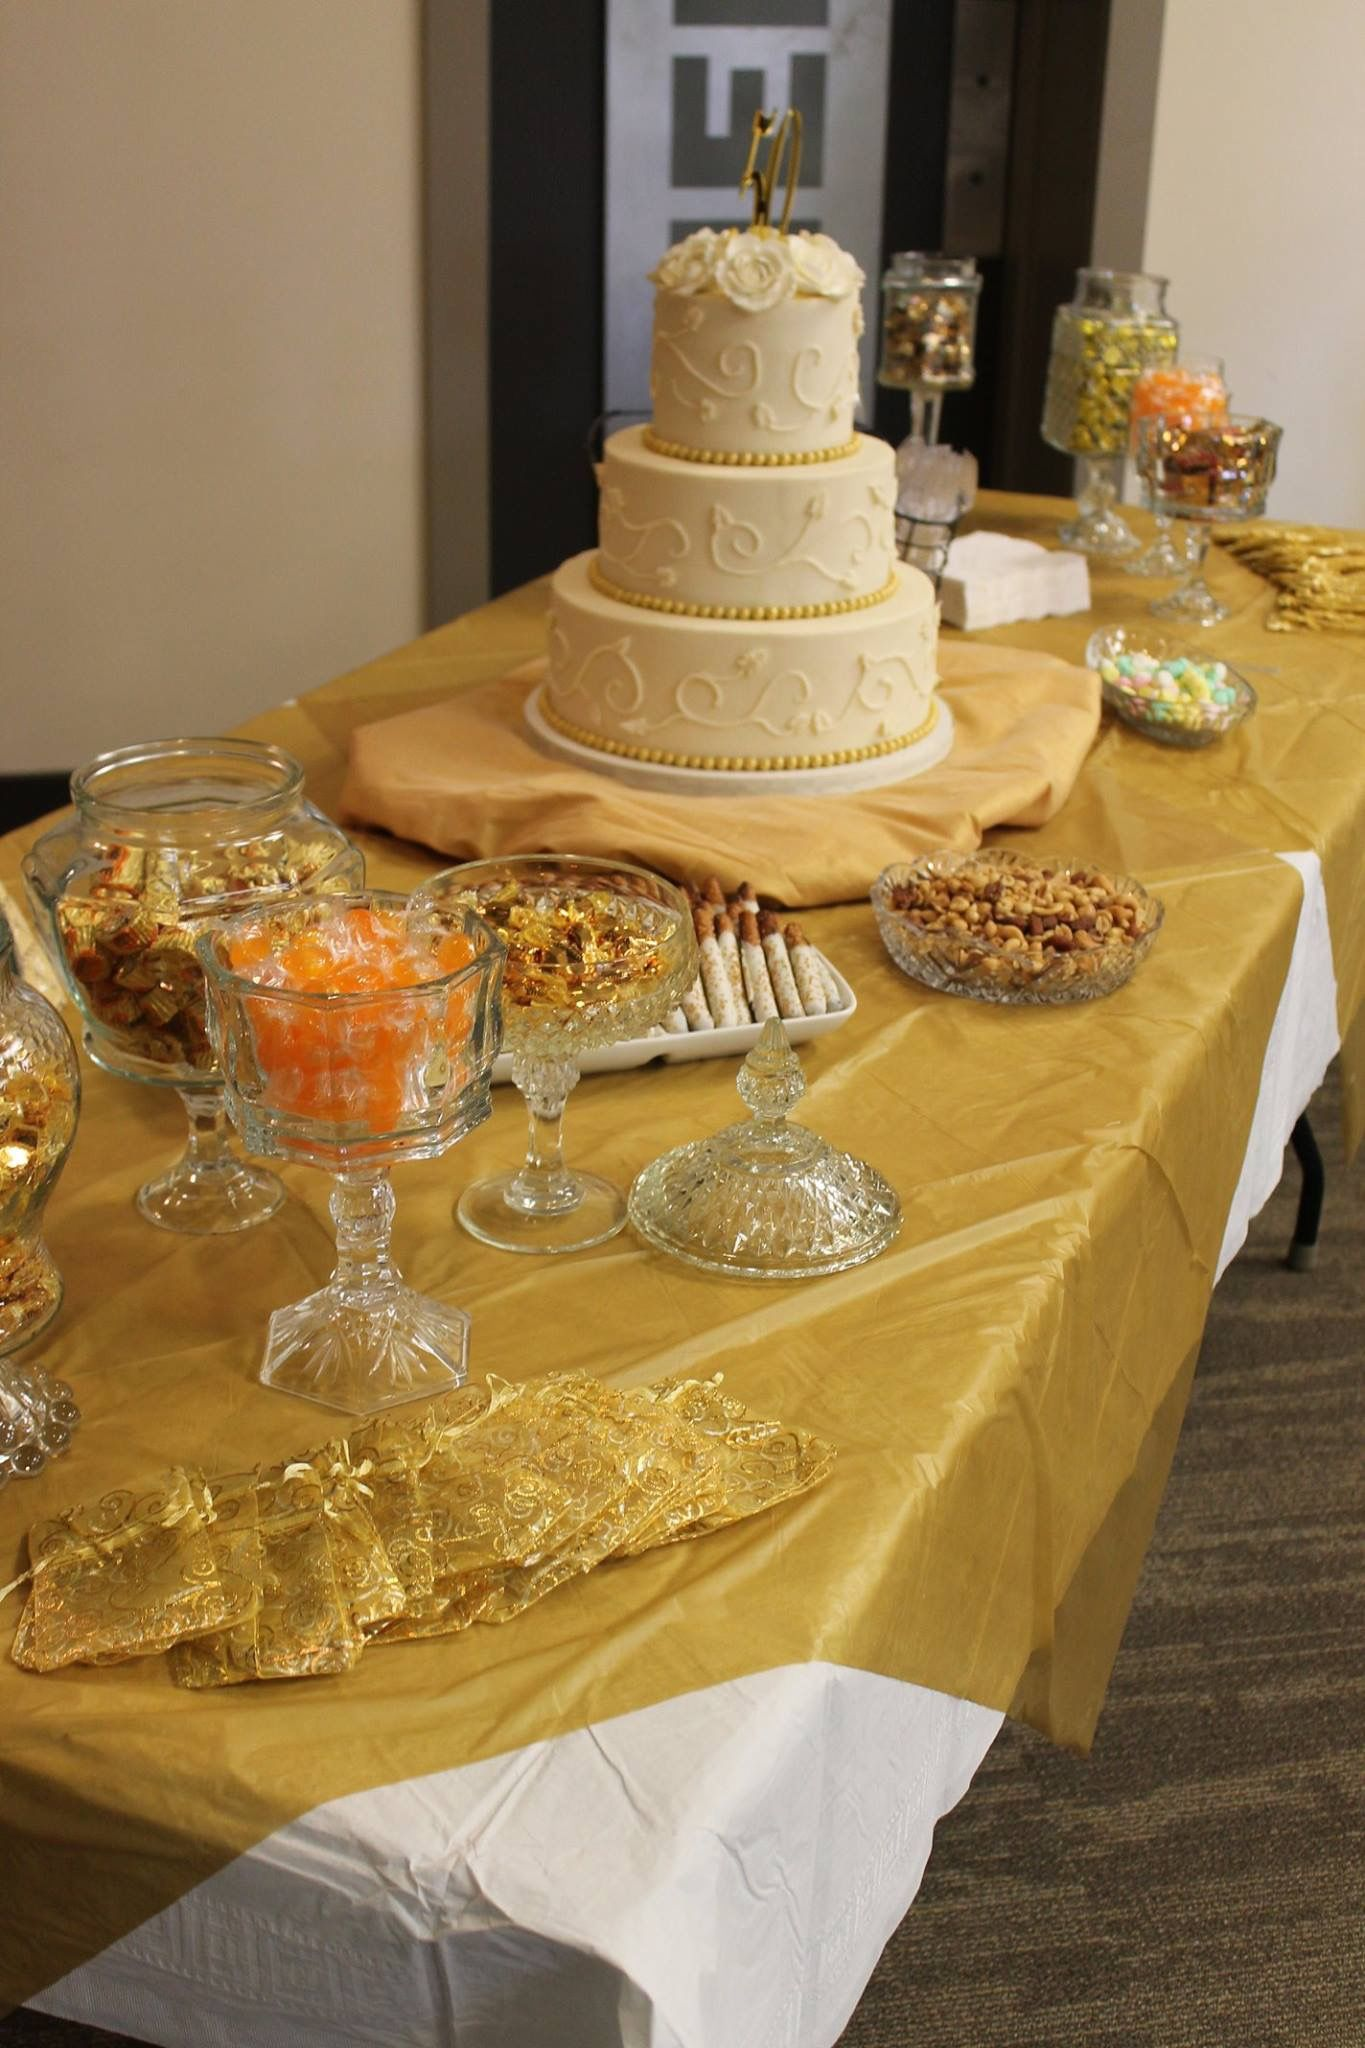 50th Anniversary Cake Table 50th Wedding Anniversary Cakes 50th Anniversary Cakes 50th Anniversary Celebration